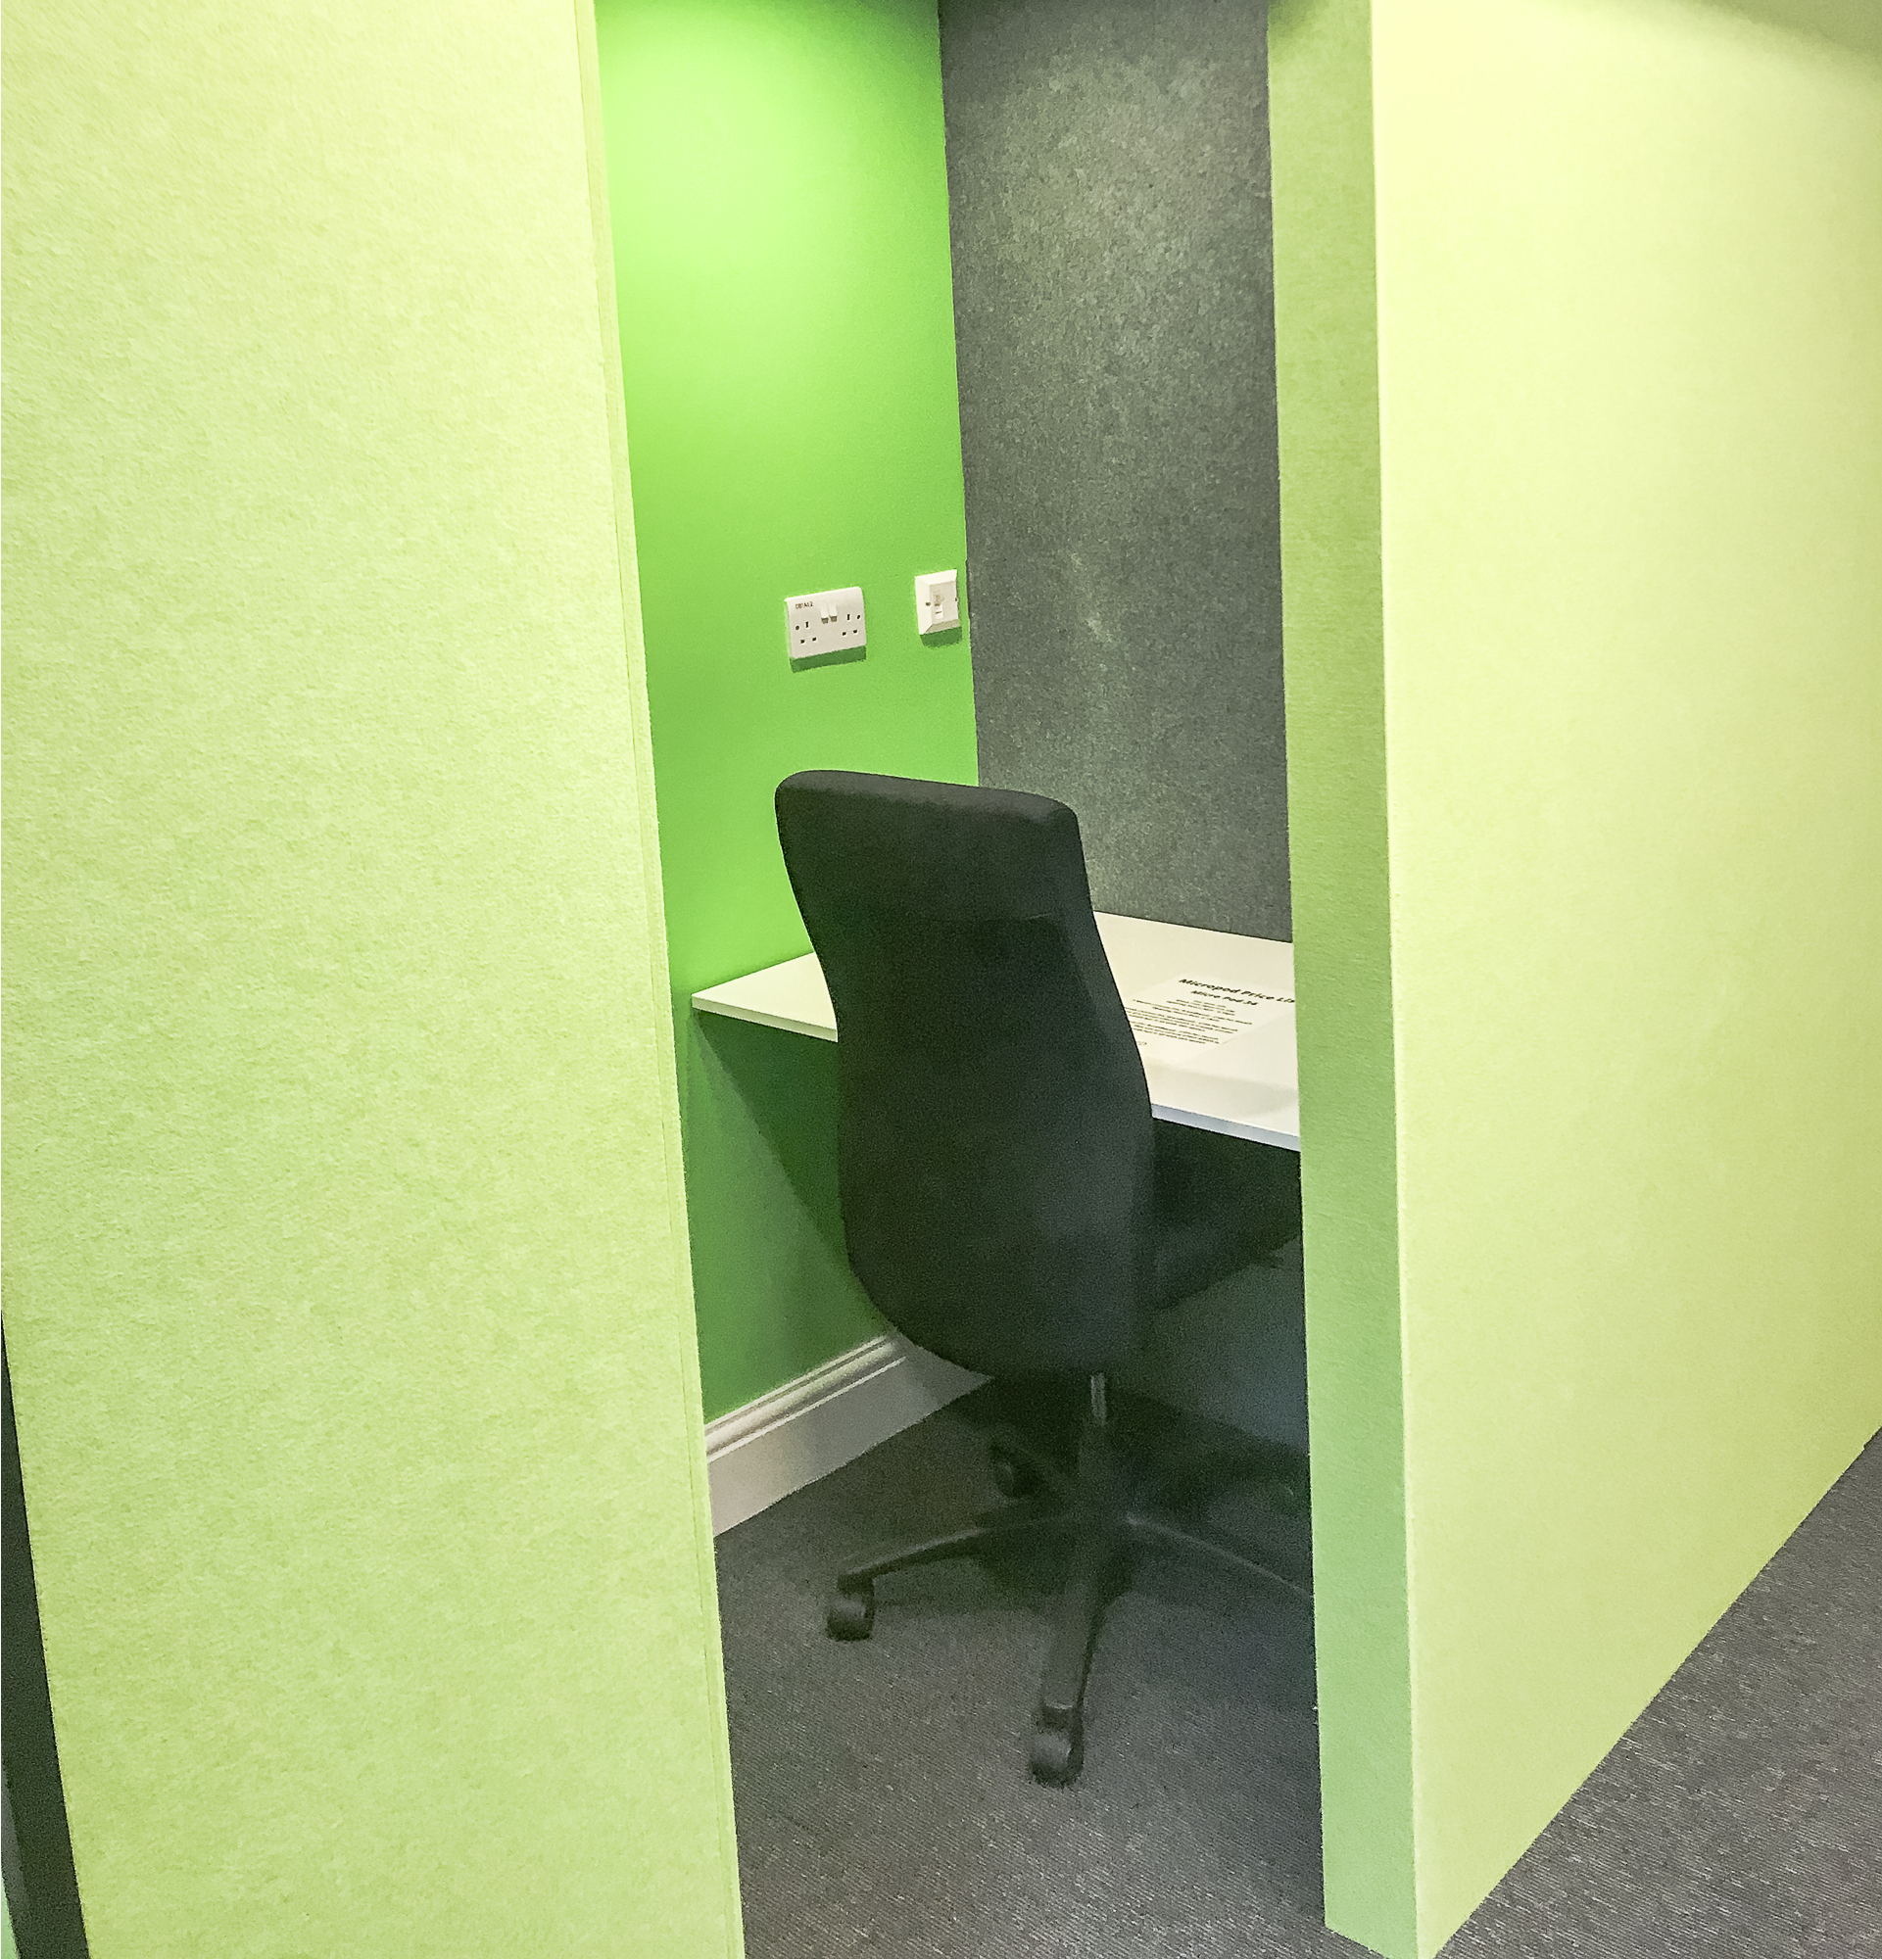 Hot Desk 1 - Liscard Business Centre